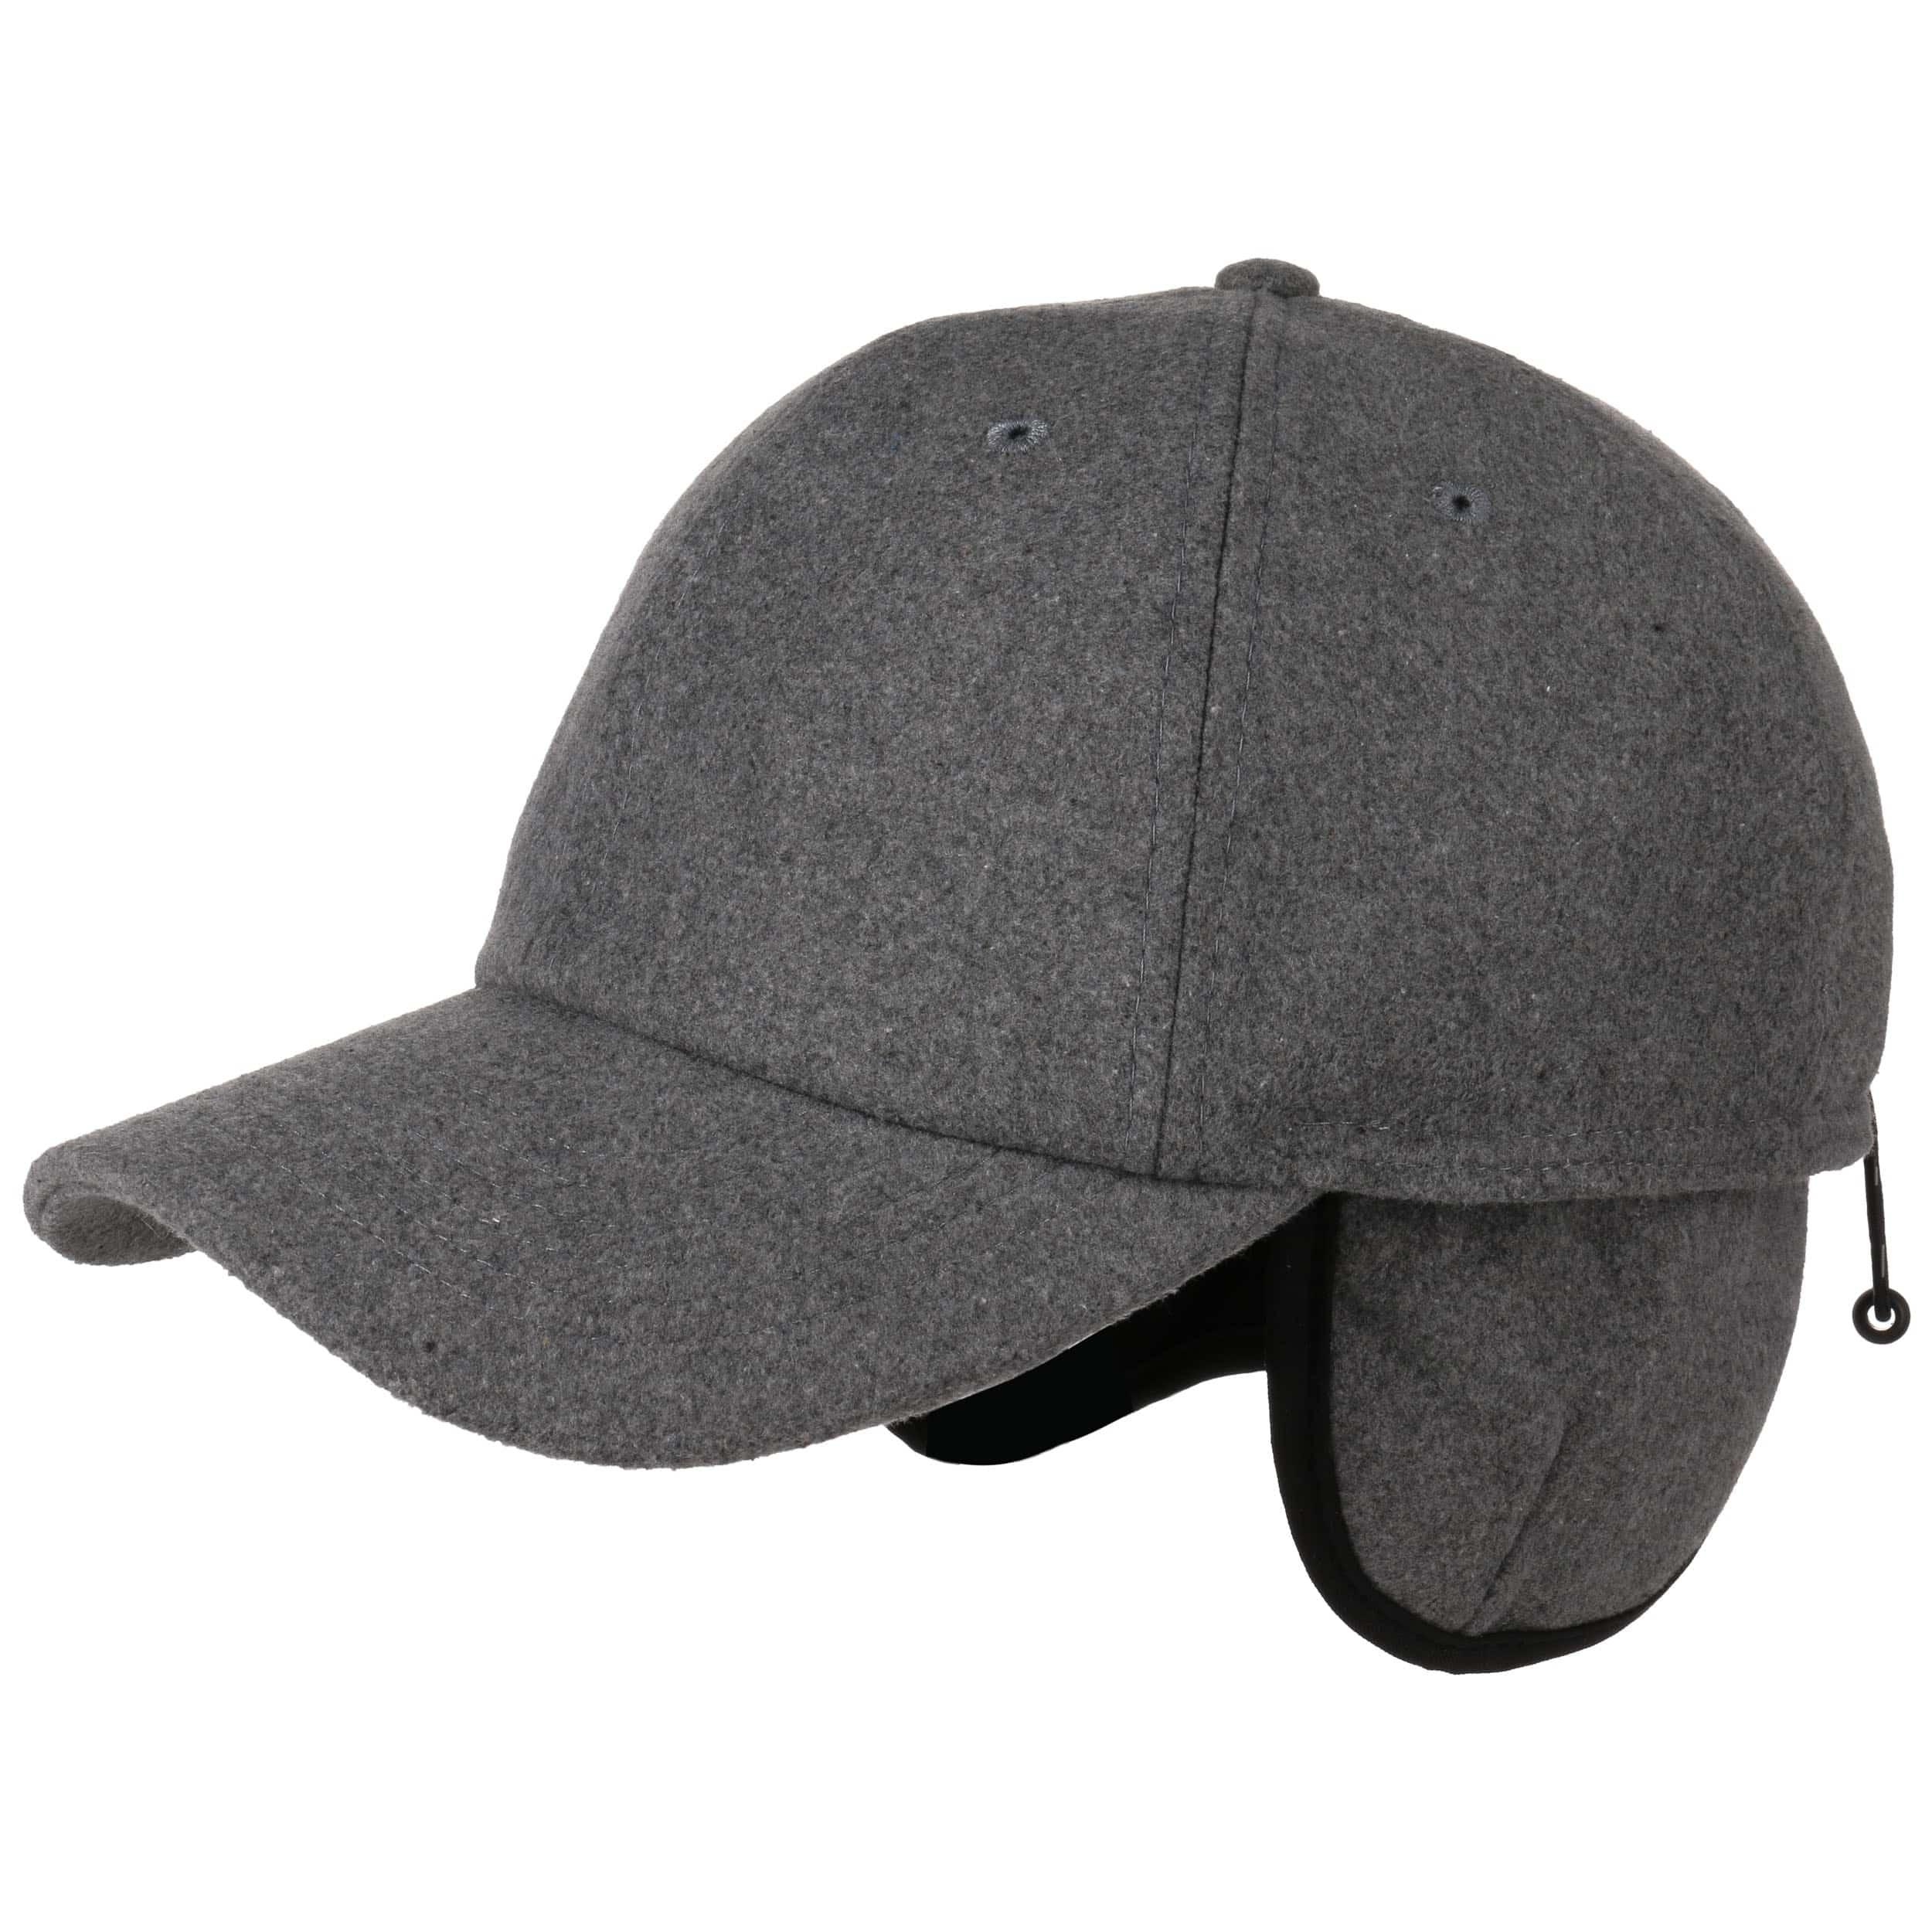 85d4227b134 ... Smart Fleece Cap - anthracite 7 ...